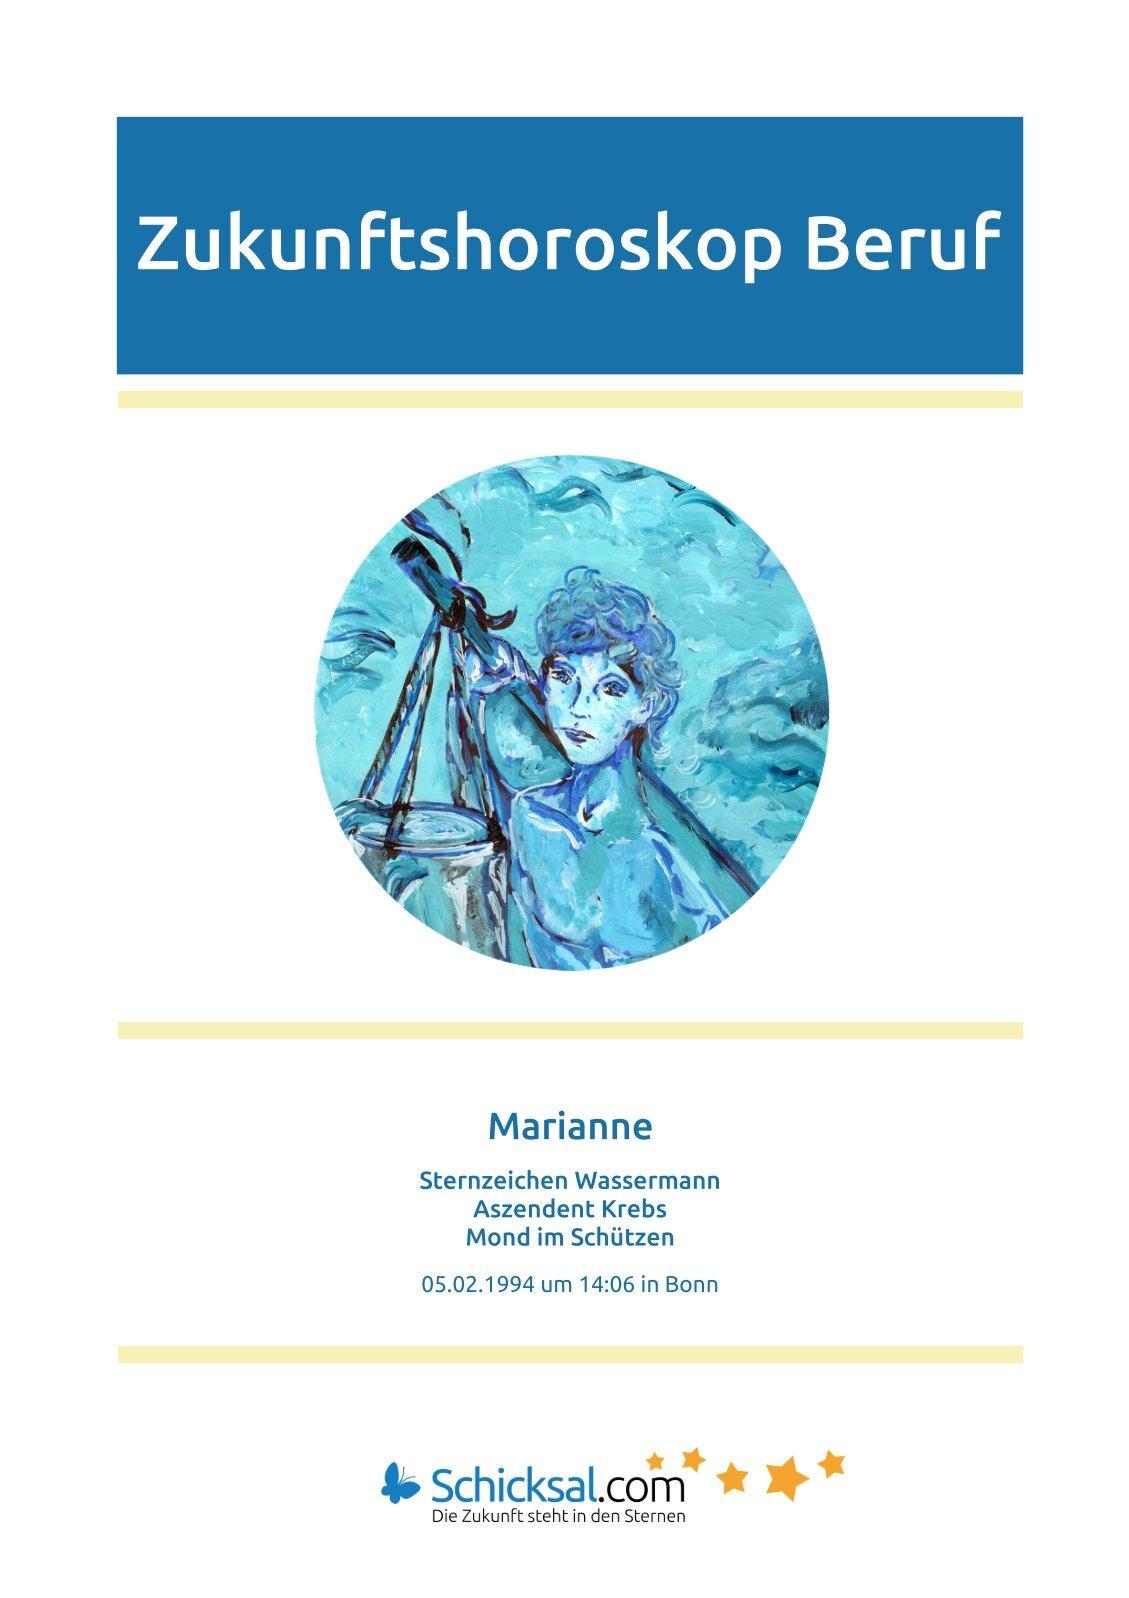 Wassermann - Horoskop Zukunft Beruf + Karriere